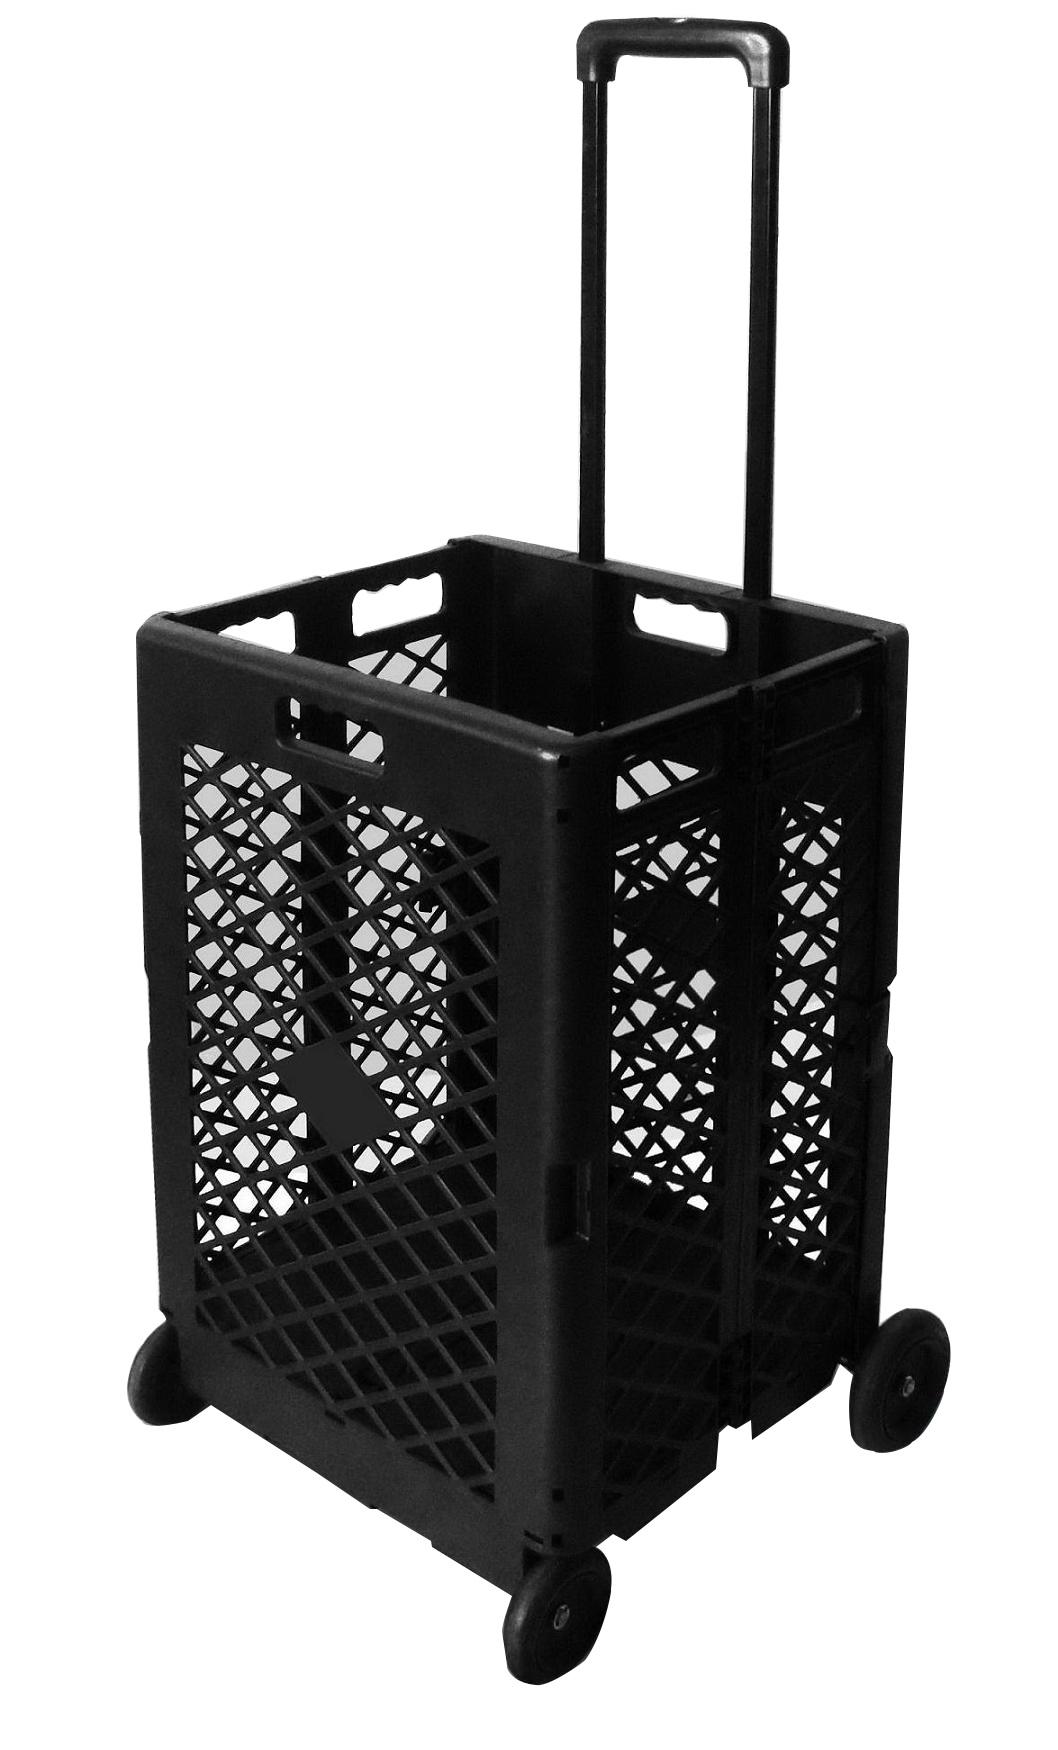 Extra Capacity Plastic Shopping Cart